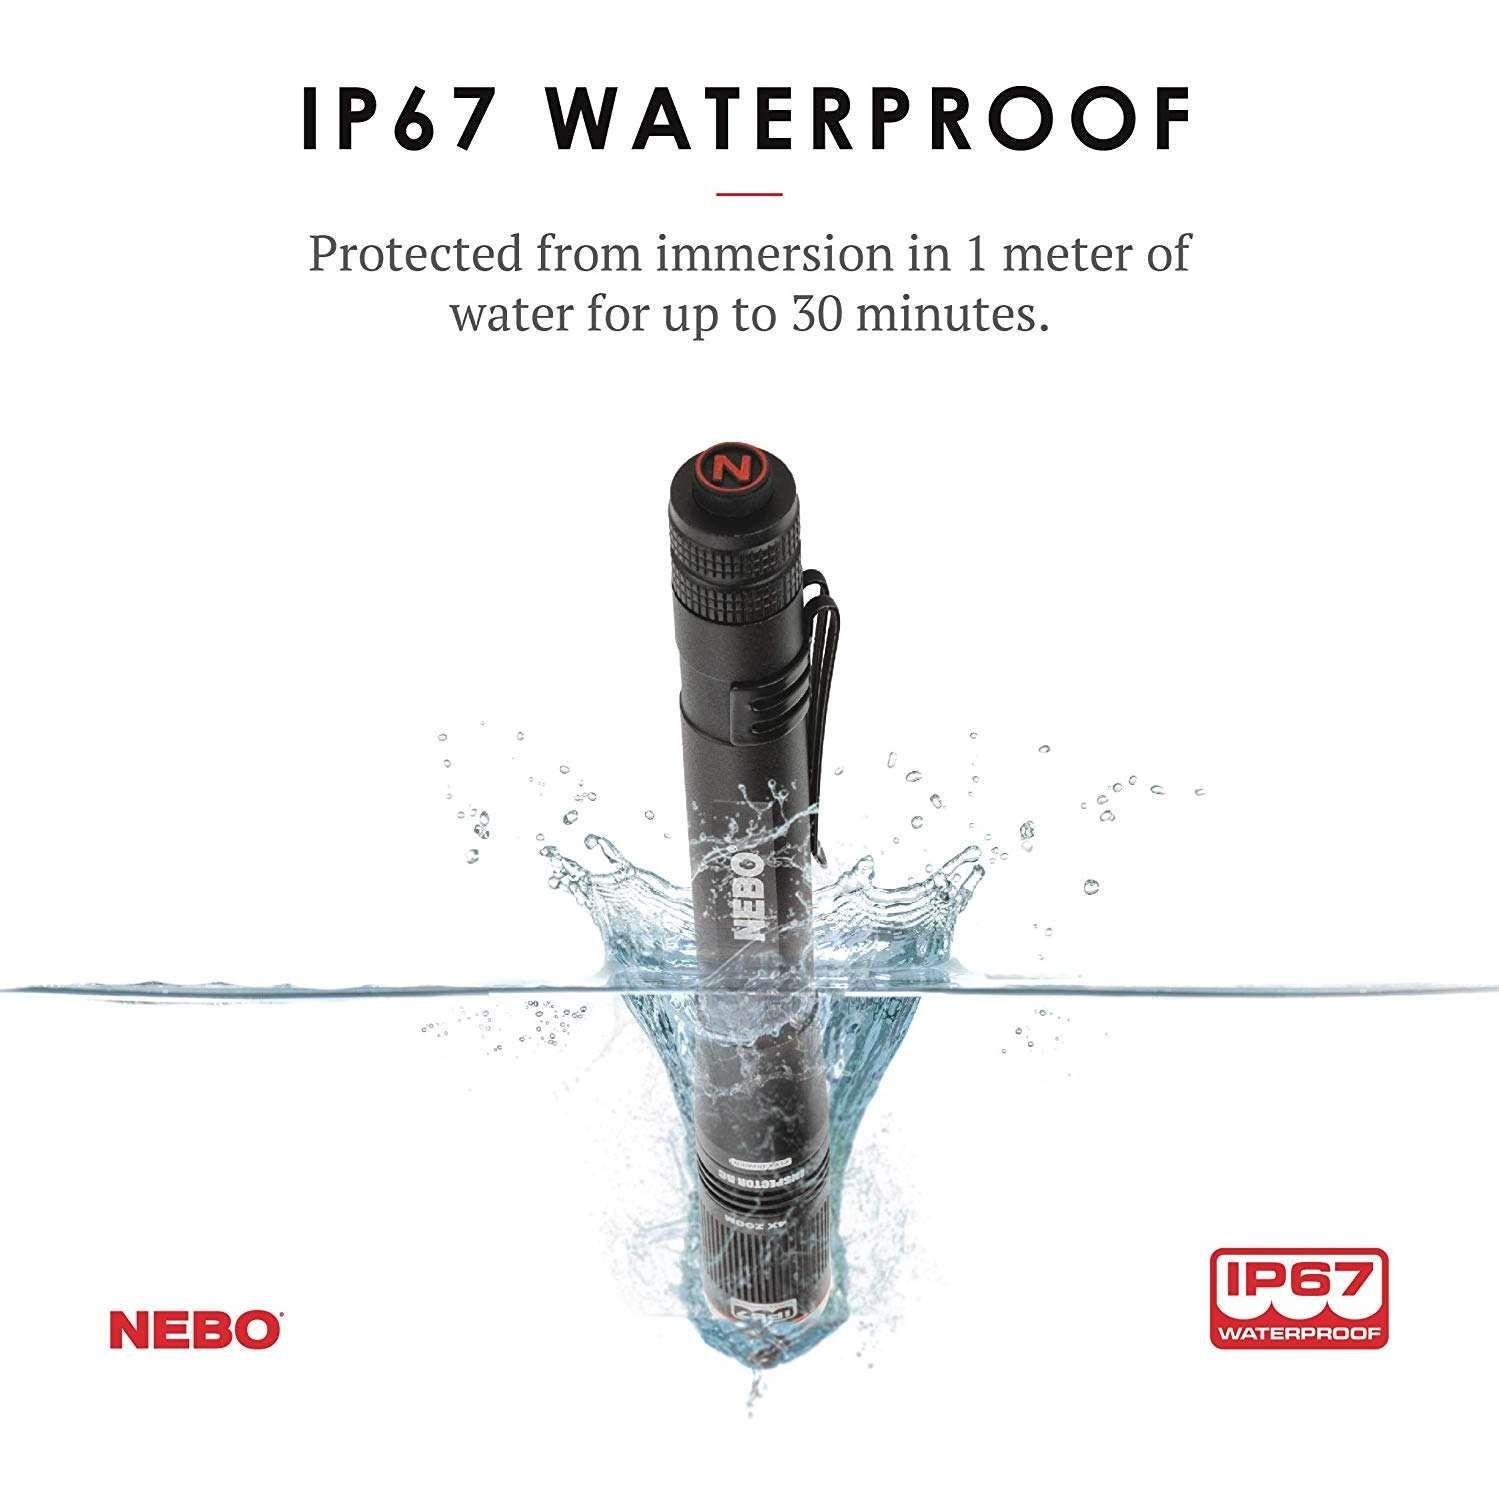 NEBO INSPECTOR 180 Lumens Zoom USB Rechargeable Pocket Pen Light